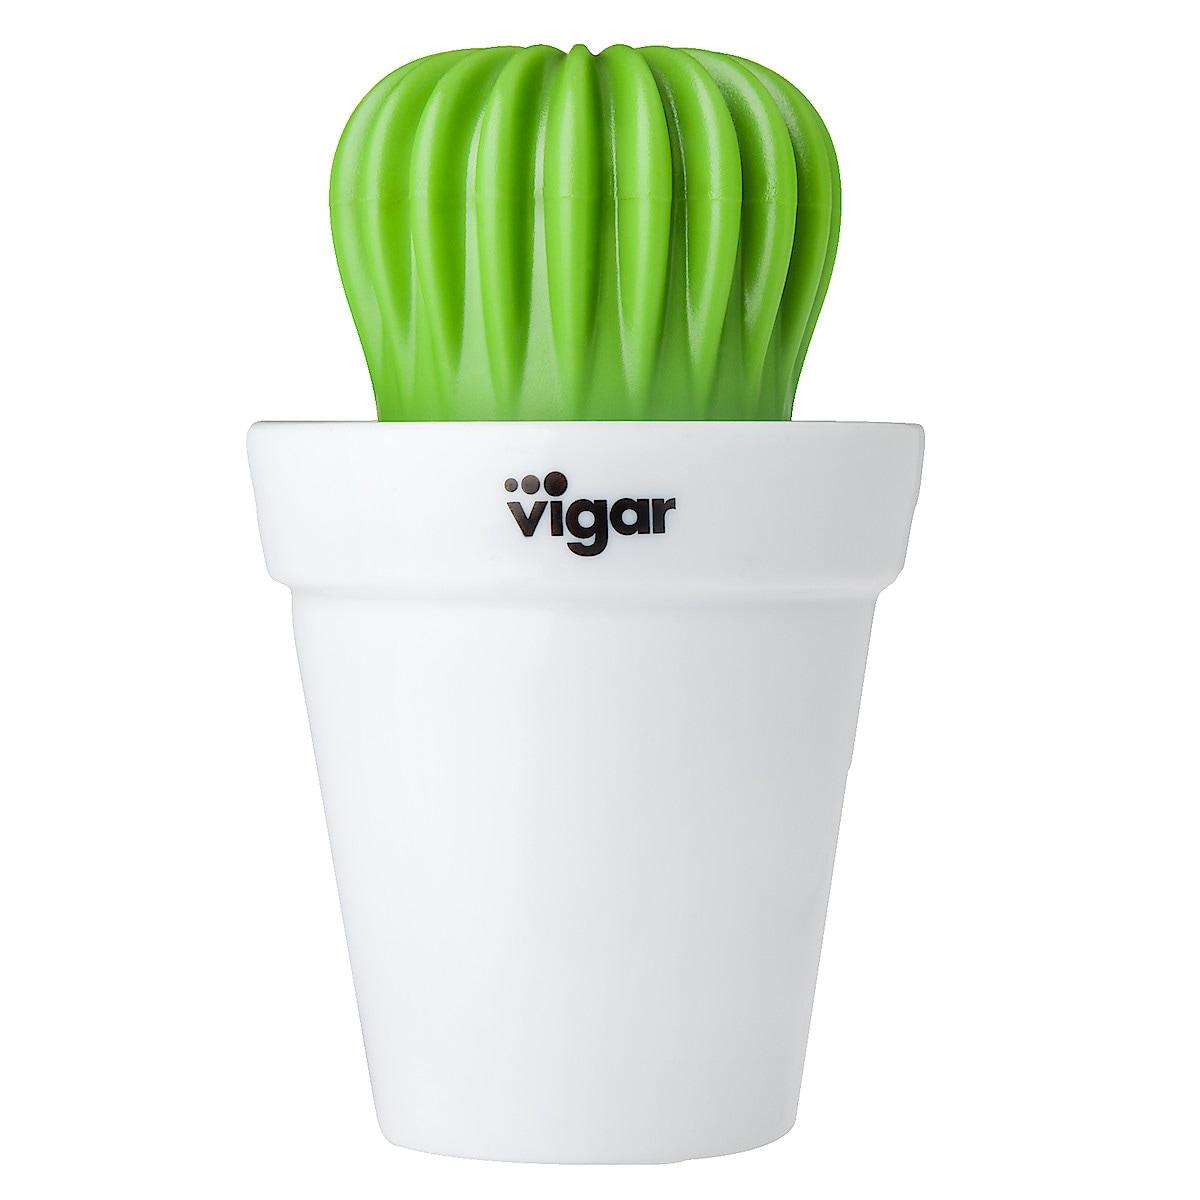 Diskborste Kaktus Vigar